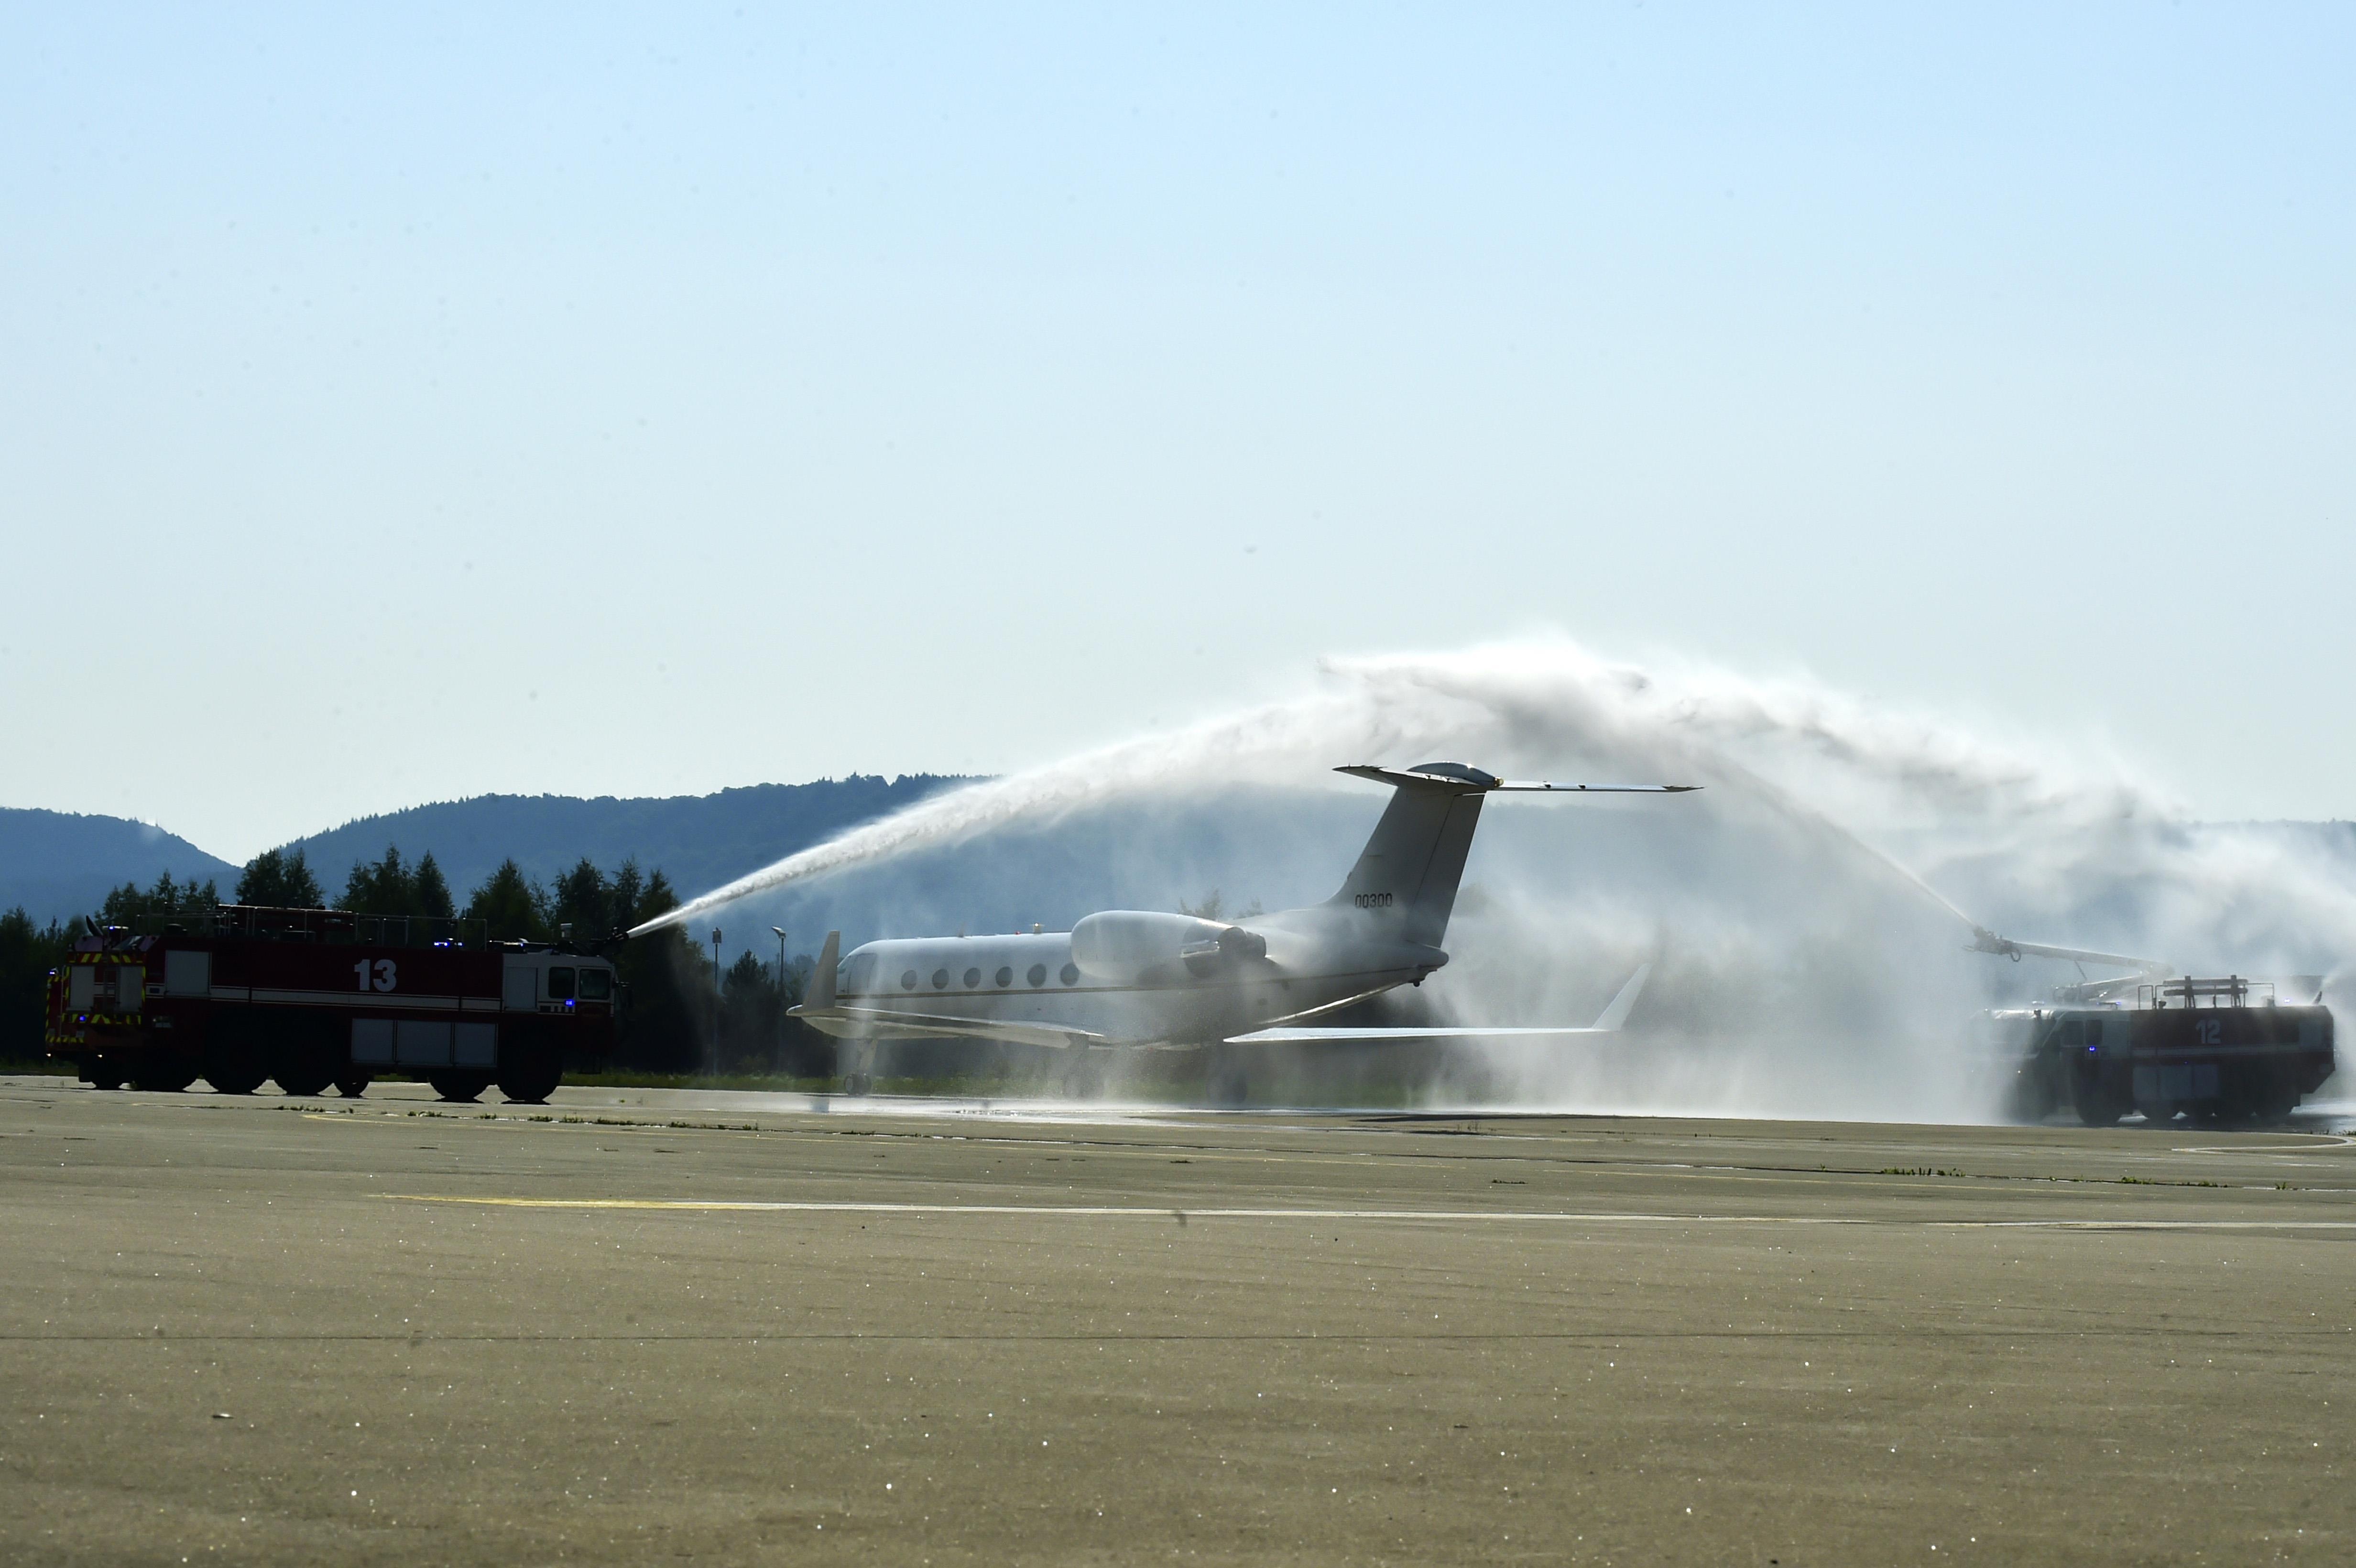 leavin u0027 on a jet plane u003e ramstein air base u003e article display